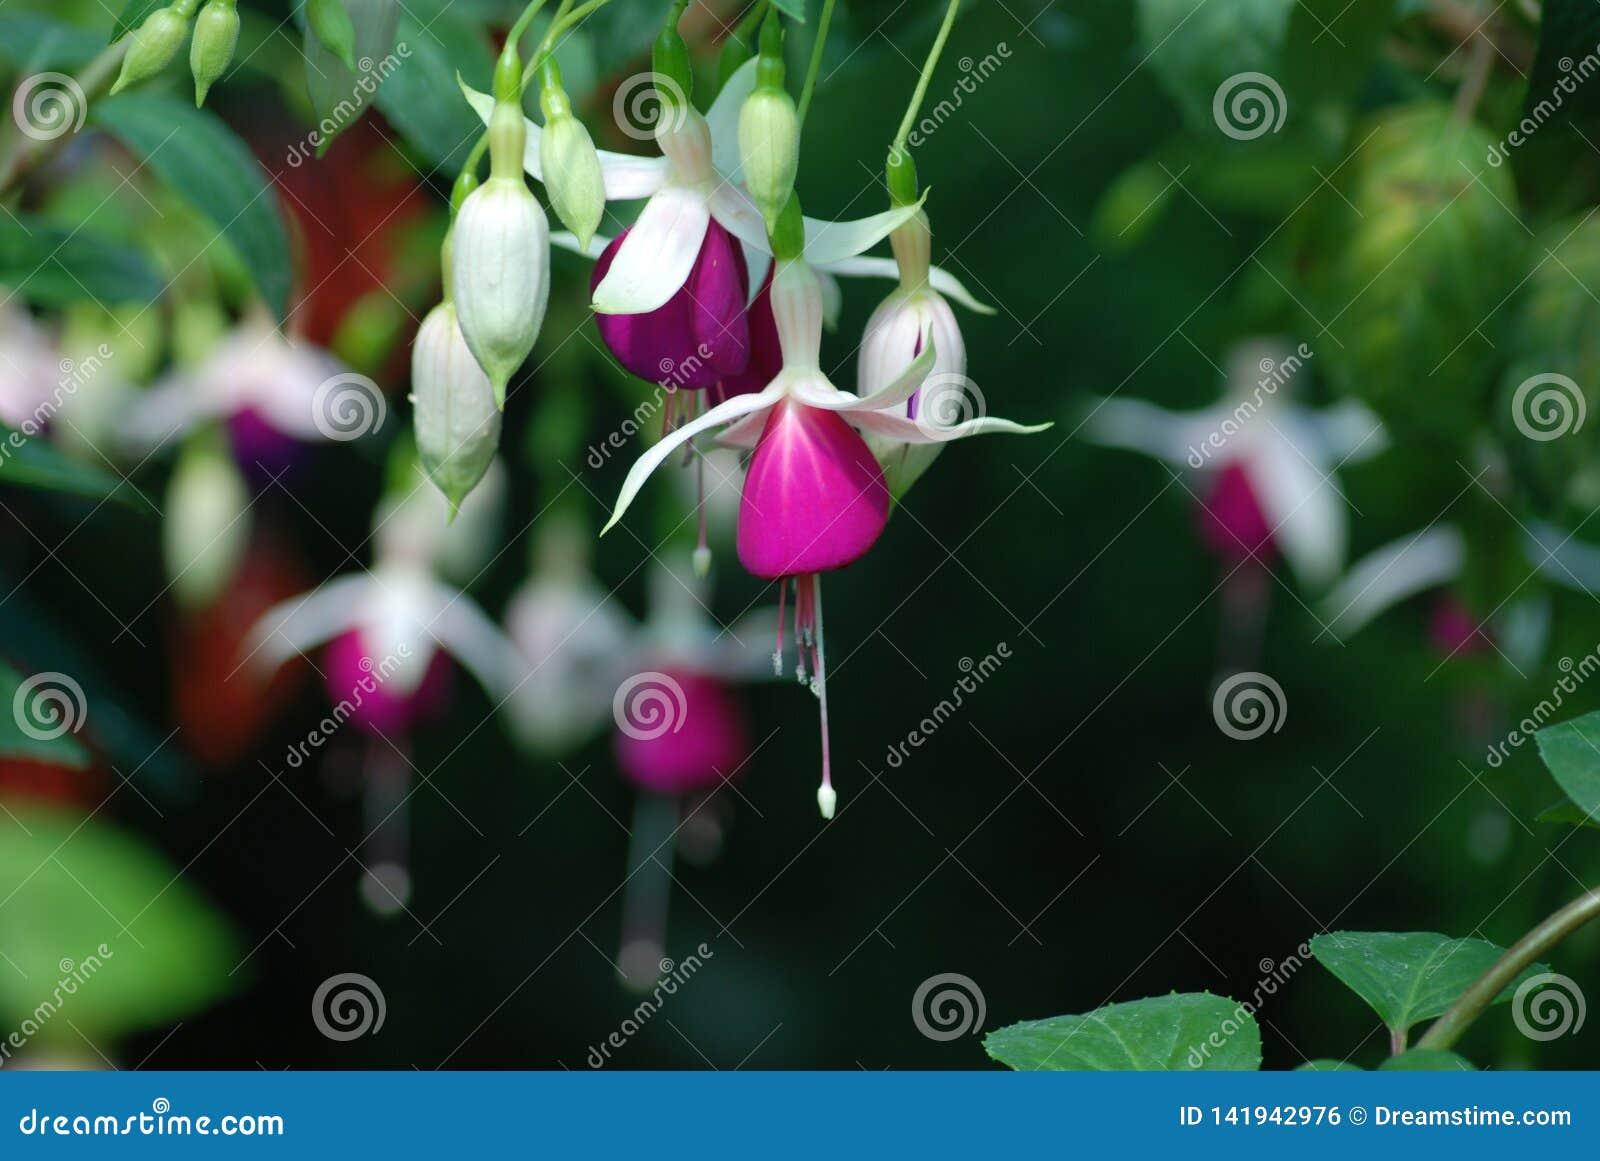 Downward Hanging White Purple Fuchsia Blooms